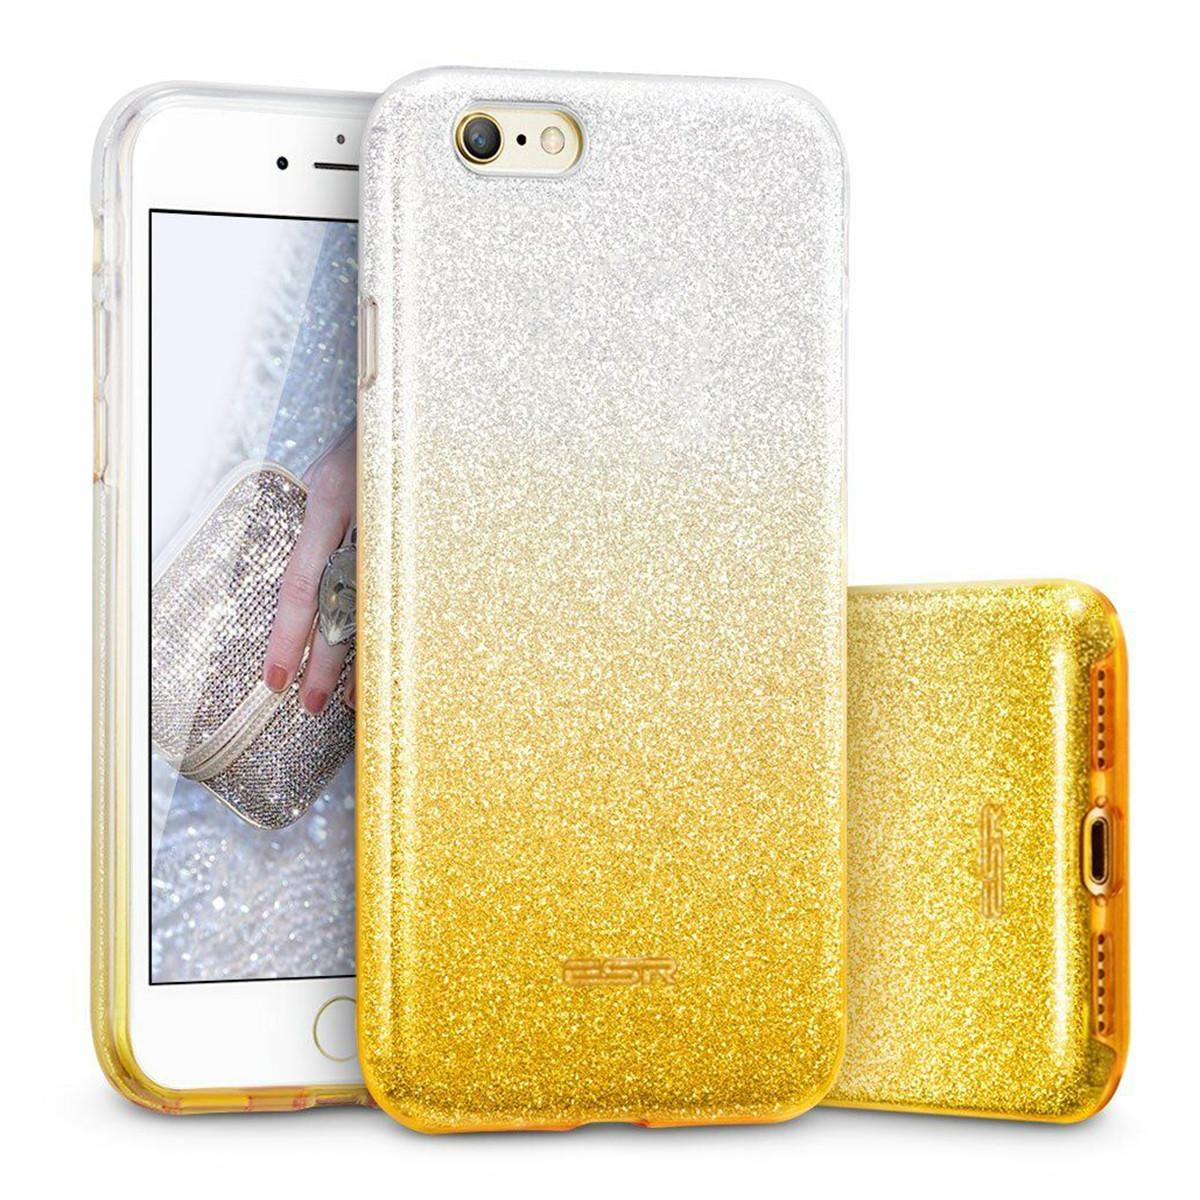 Чехол силиконовый TPU (iPhone SE 2020 / 8 / 7) SKY-ESR (X000Q9UHQ5) Silver/Gold